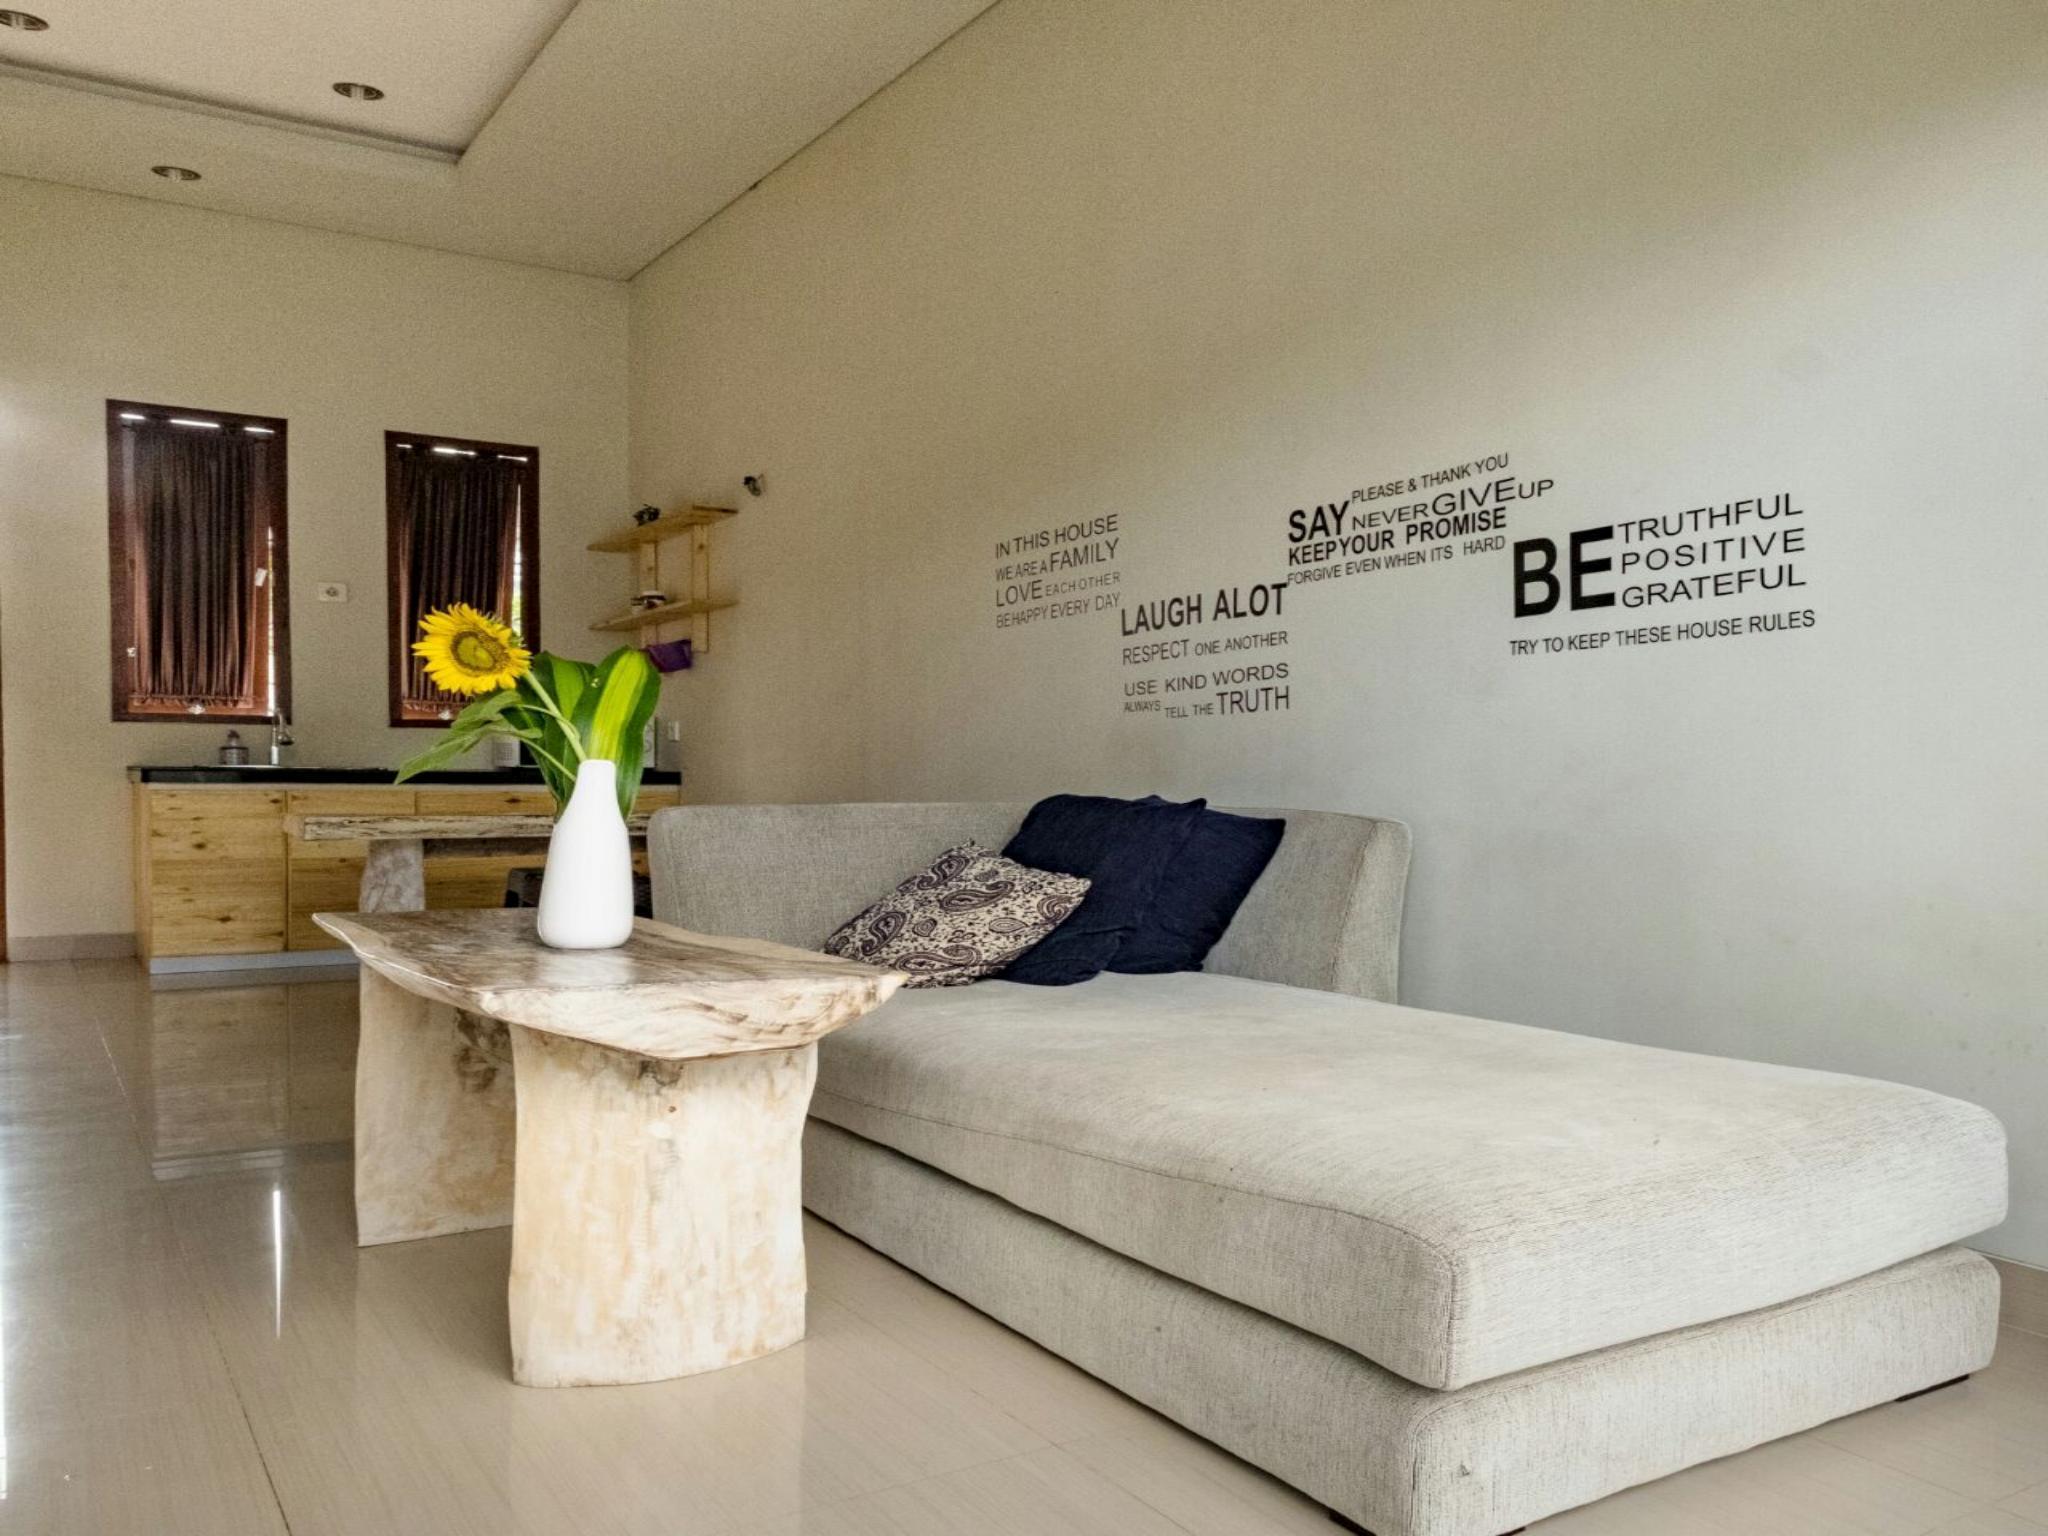 Hotel Bale Village C3 - kerobokan - Bali